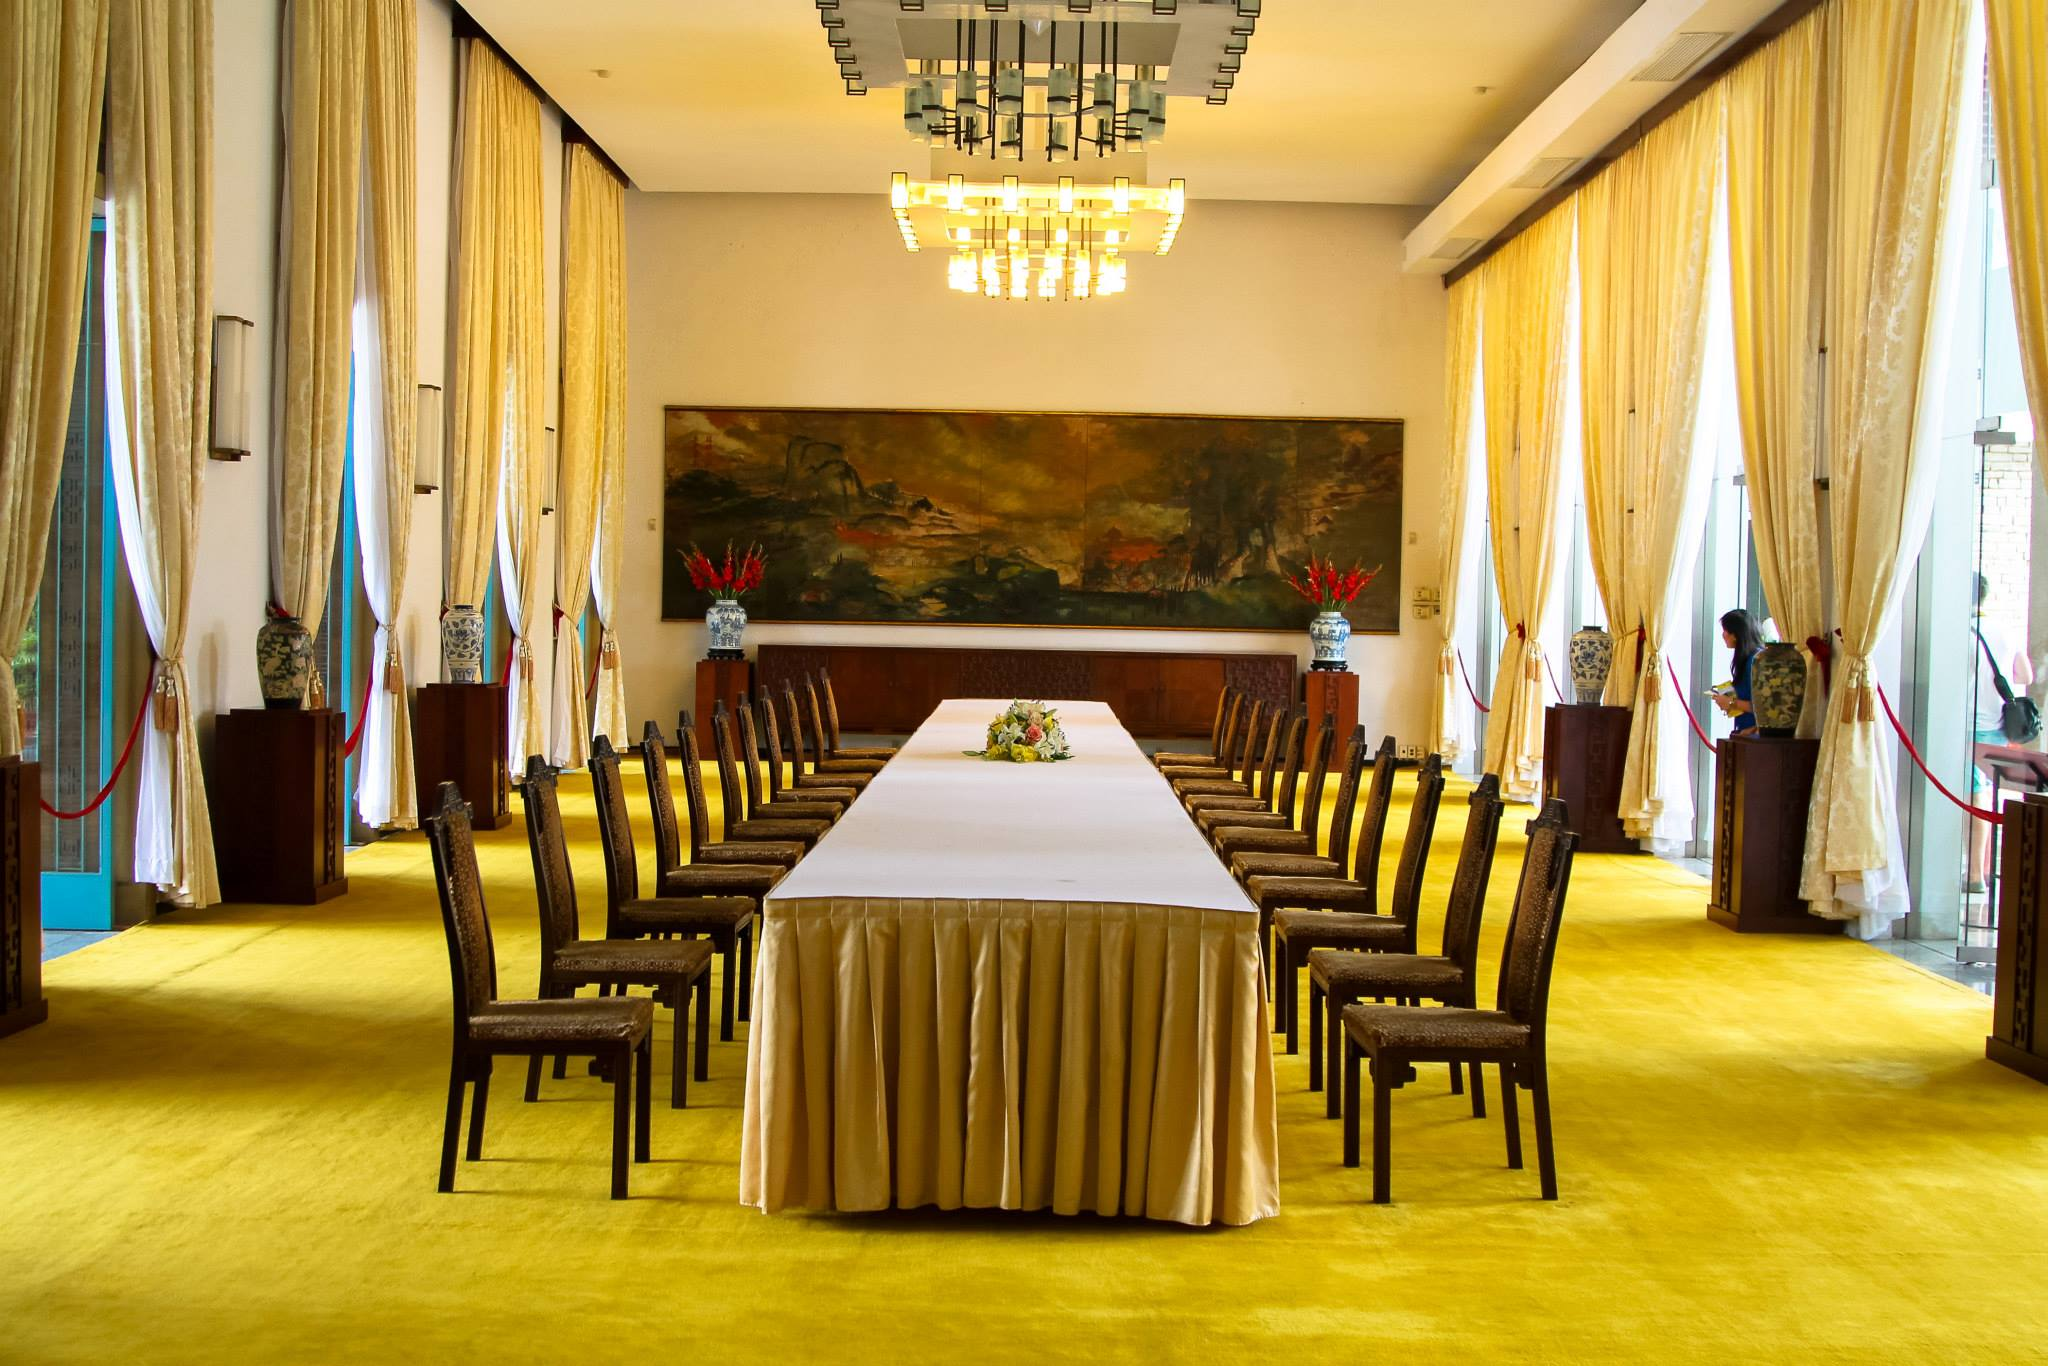 Photo Diary: Visiting Independence Palace in Saigon, Vietnam (6)